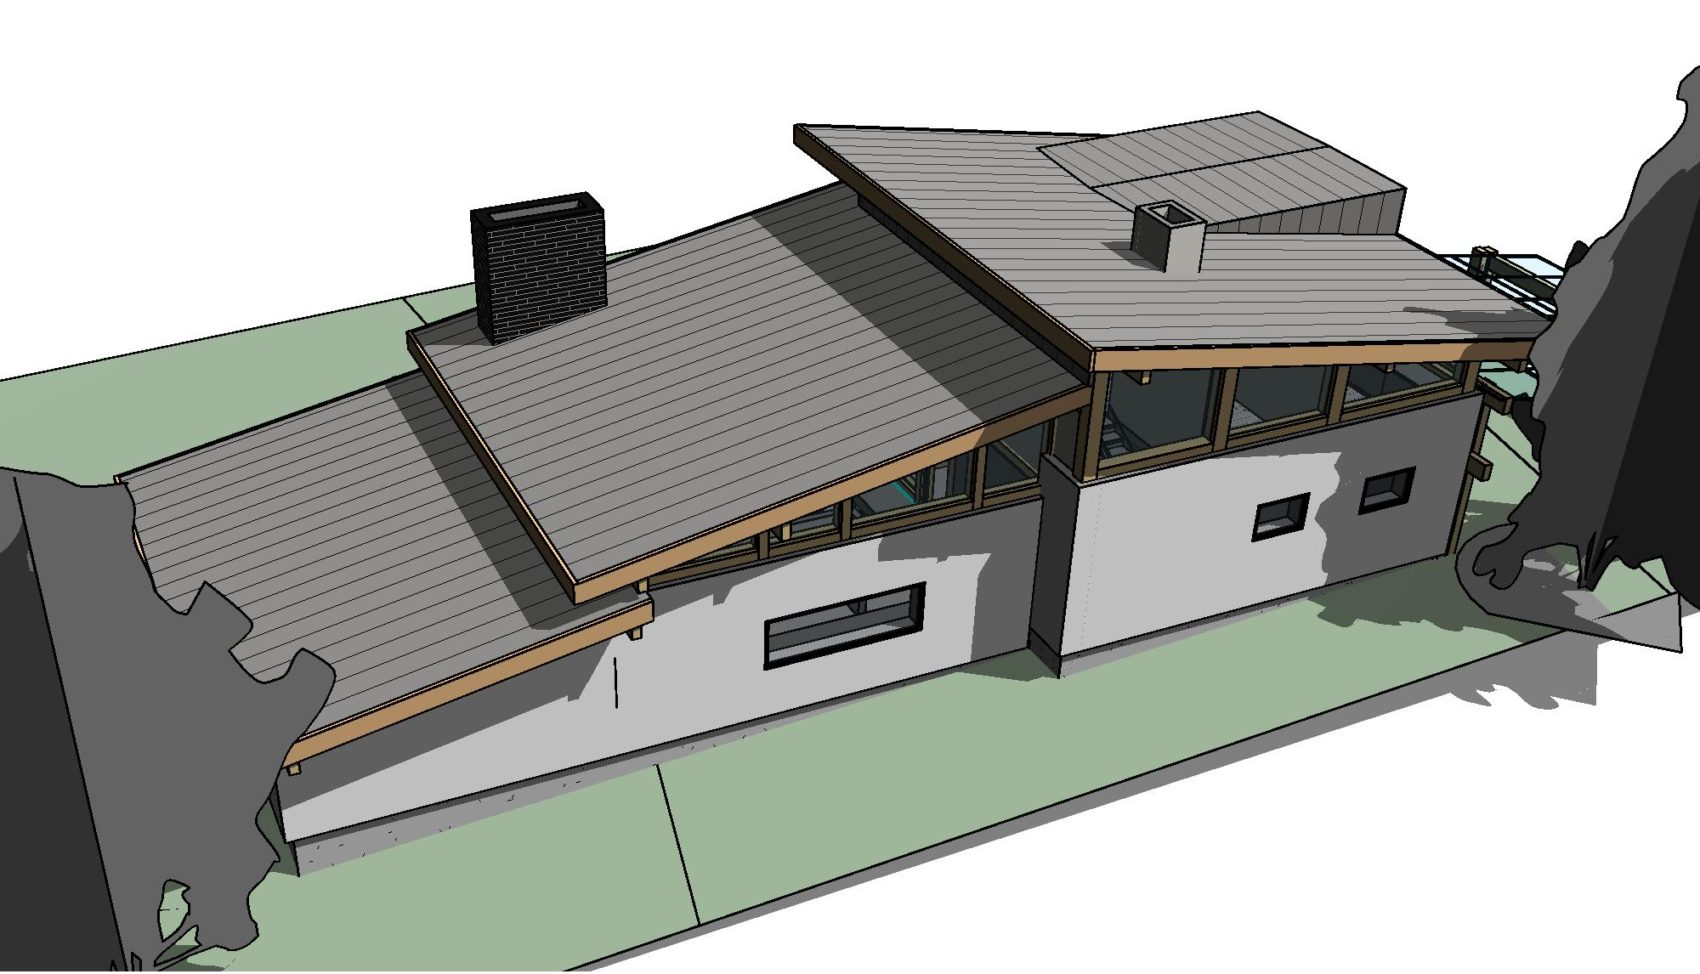 проект комбинации кирпичного и фахверкового дома